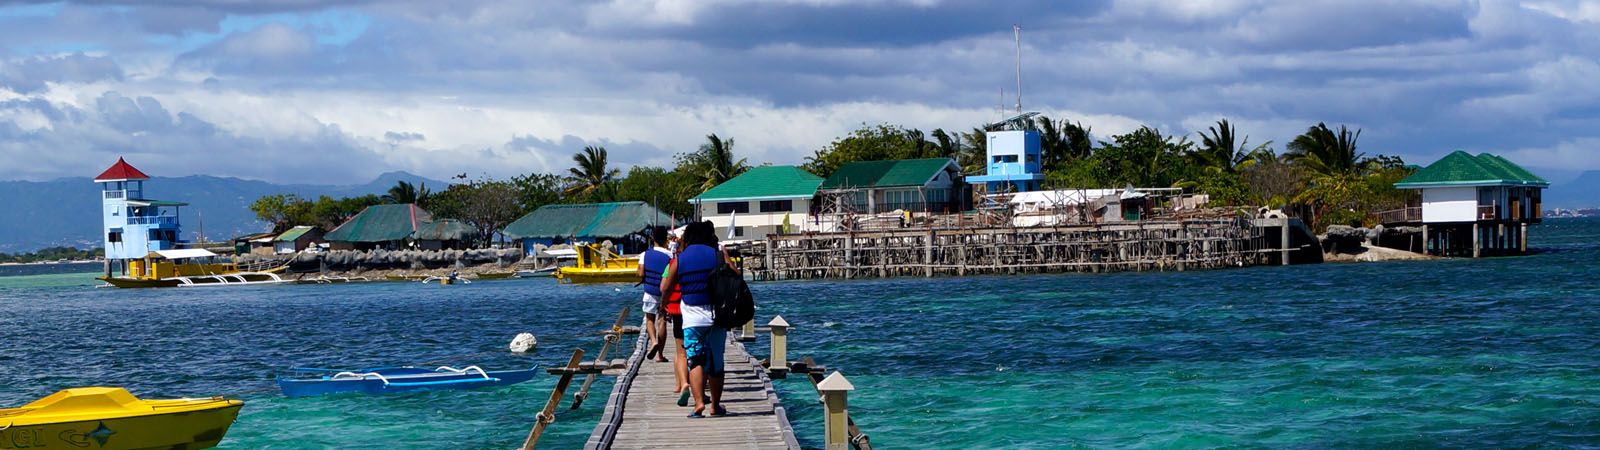 study medicine in the philippines | Santamonica Study Abroad